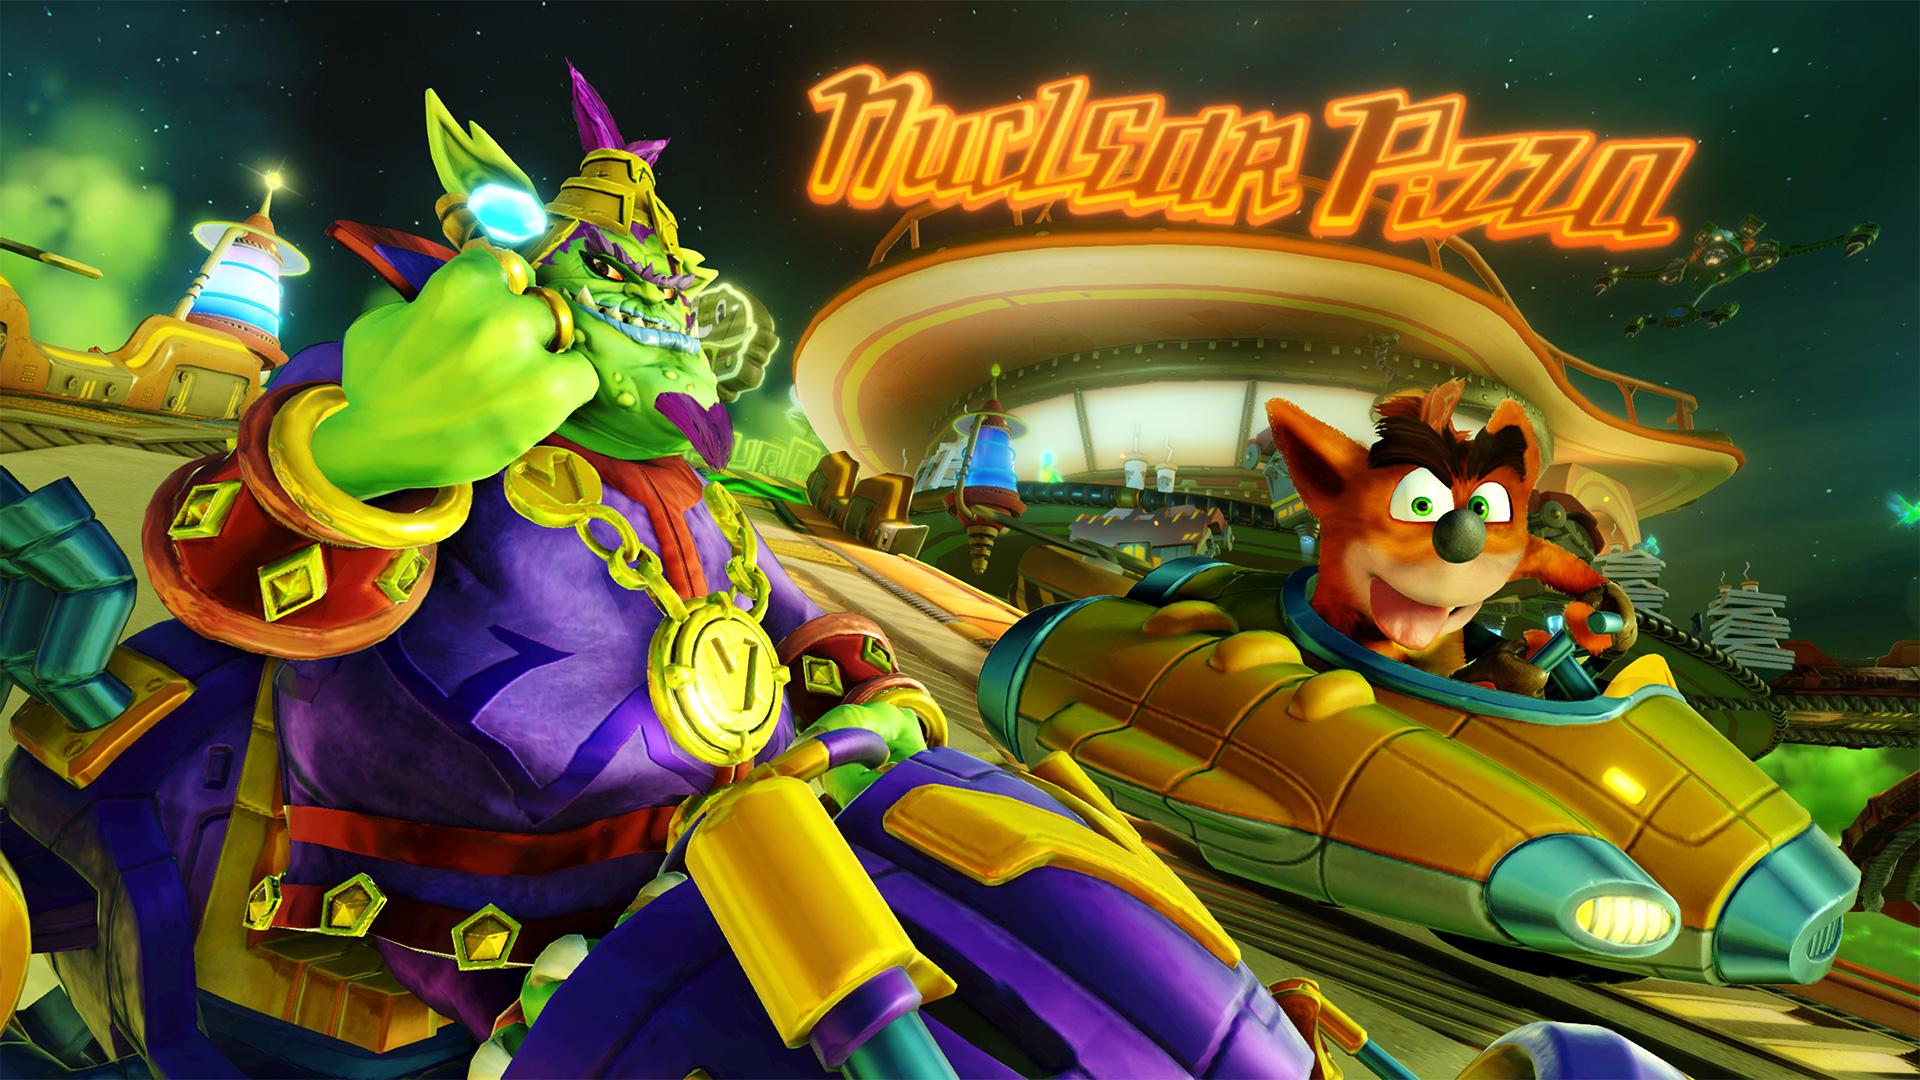 Emperor Velo is back for the final Crash Team Racing Grand Prix screenshot